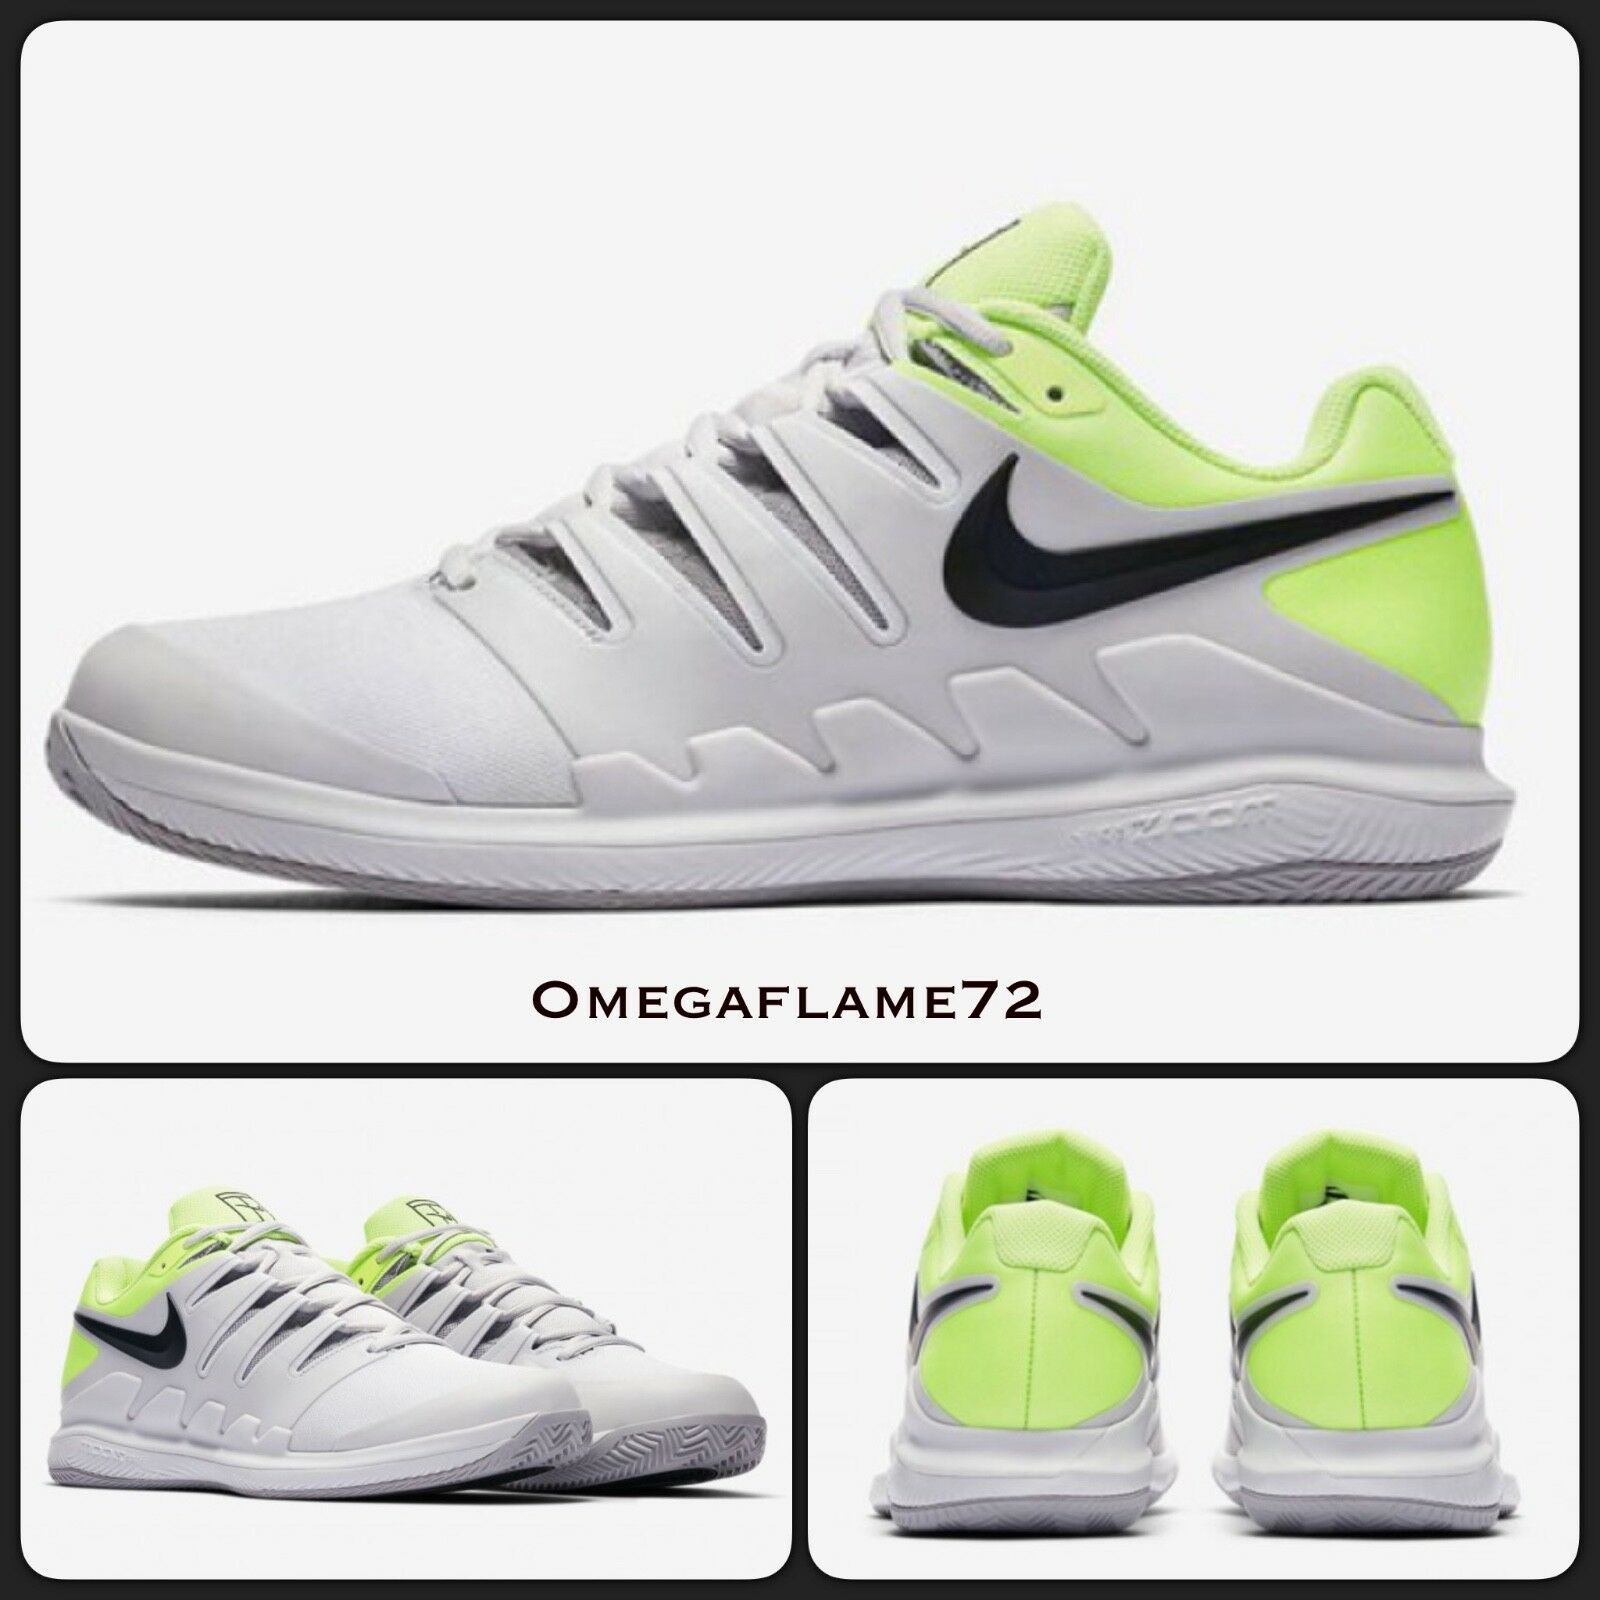 Nike Zoom Vapor X Arcilla, AA80220181, UU. Reino Unido 7.5, EE. UU. AA80220181, 8.5, Federer Tenis Zapato 6ecdb6